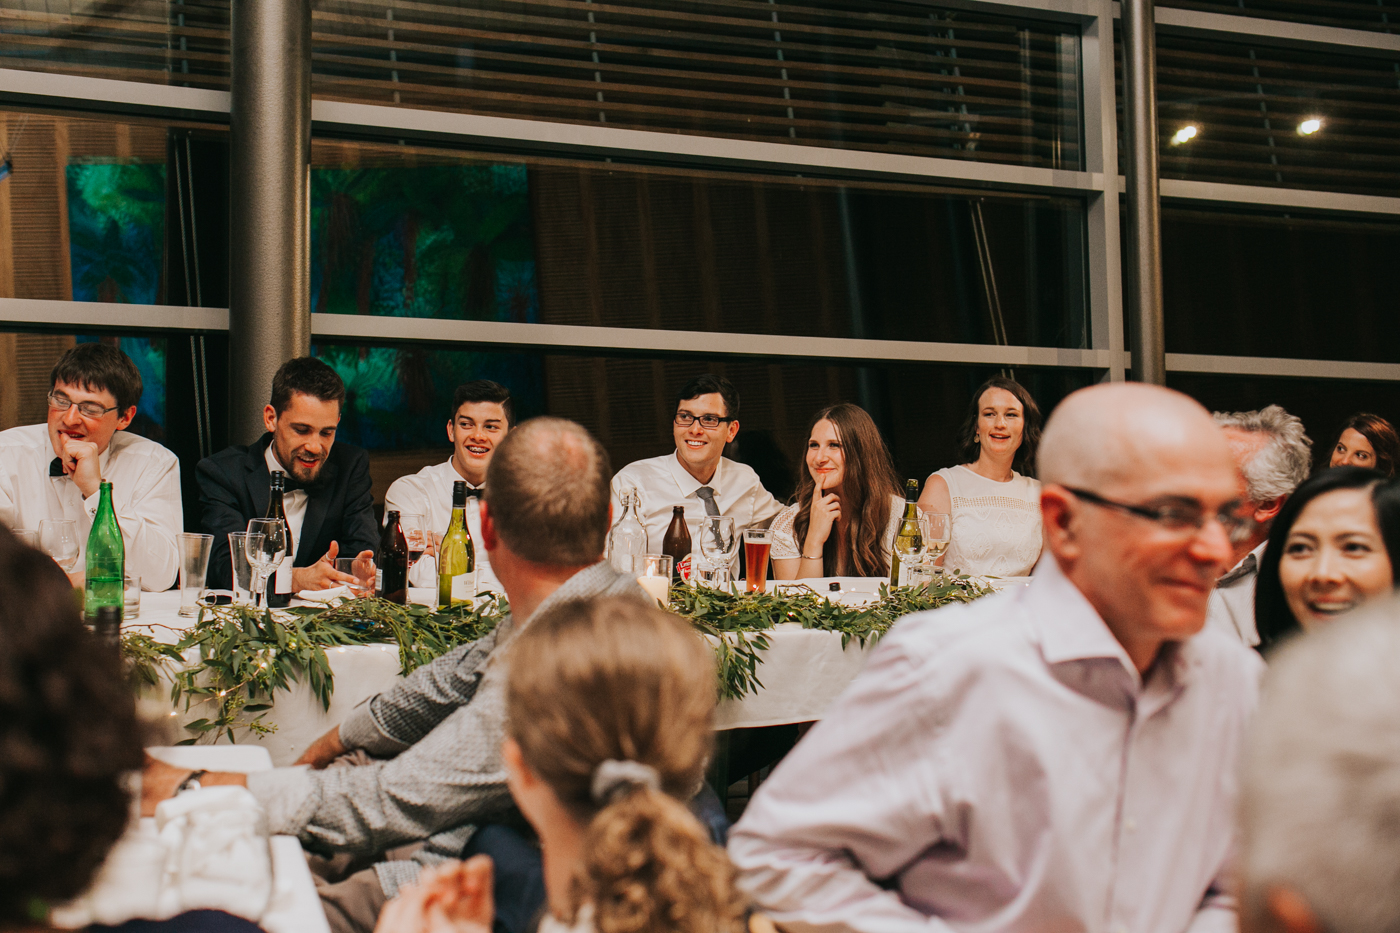 Ariana & Tim - Dunedin, New Zealand Wedding - Destination Wedding - Samantha Heather Photography-266.jpg